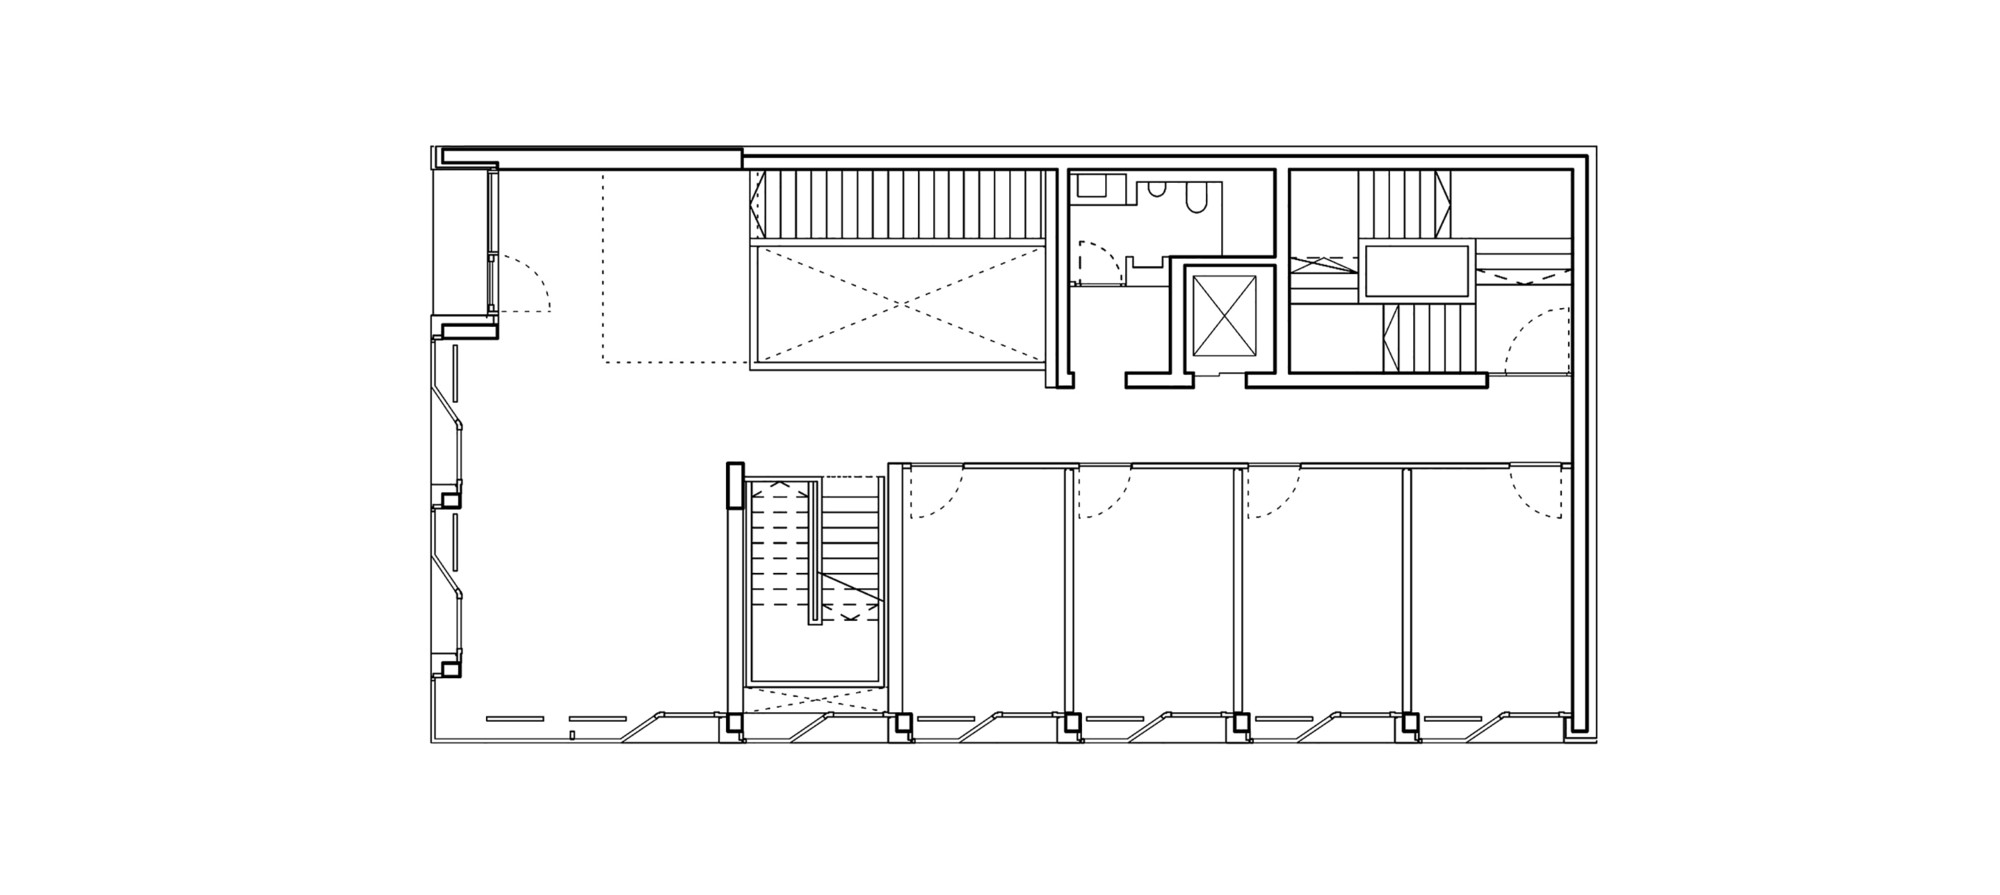 Psd bank office buildingfirst floor plan